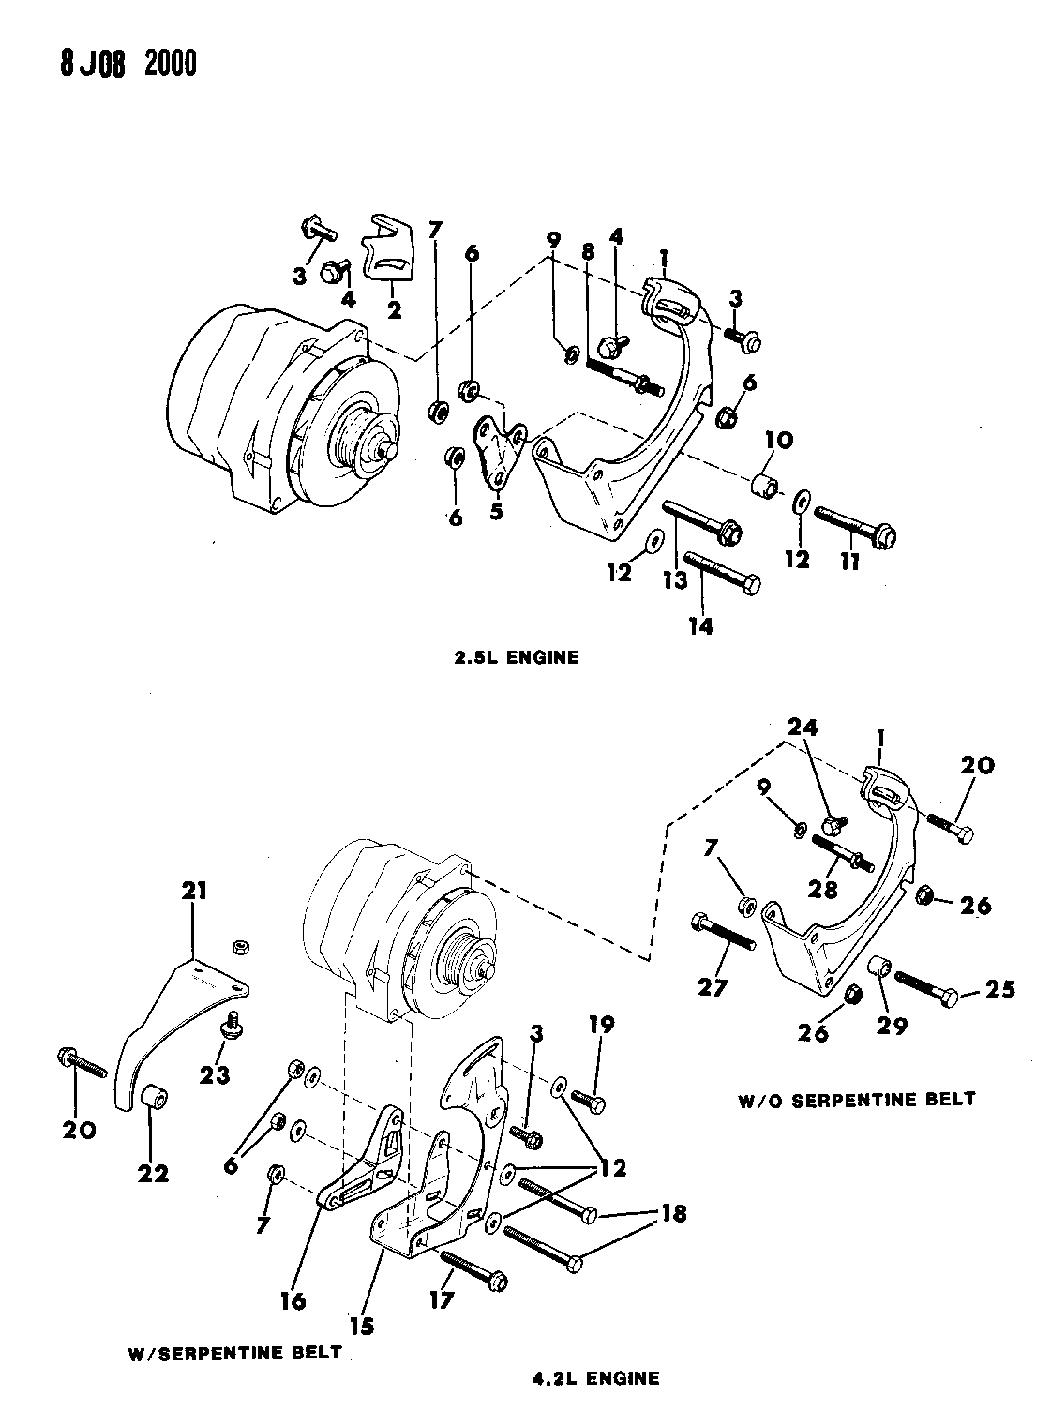 1989 jeep wrangler alternator mounting mopar parts giant rh moparpartsgiant com 1991 Jeep YJ Wiring Diagram 1999 Jeep Wrangler Wiring Diagram